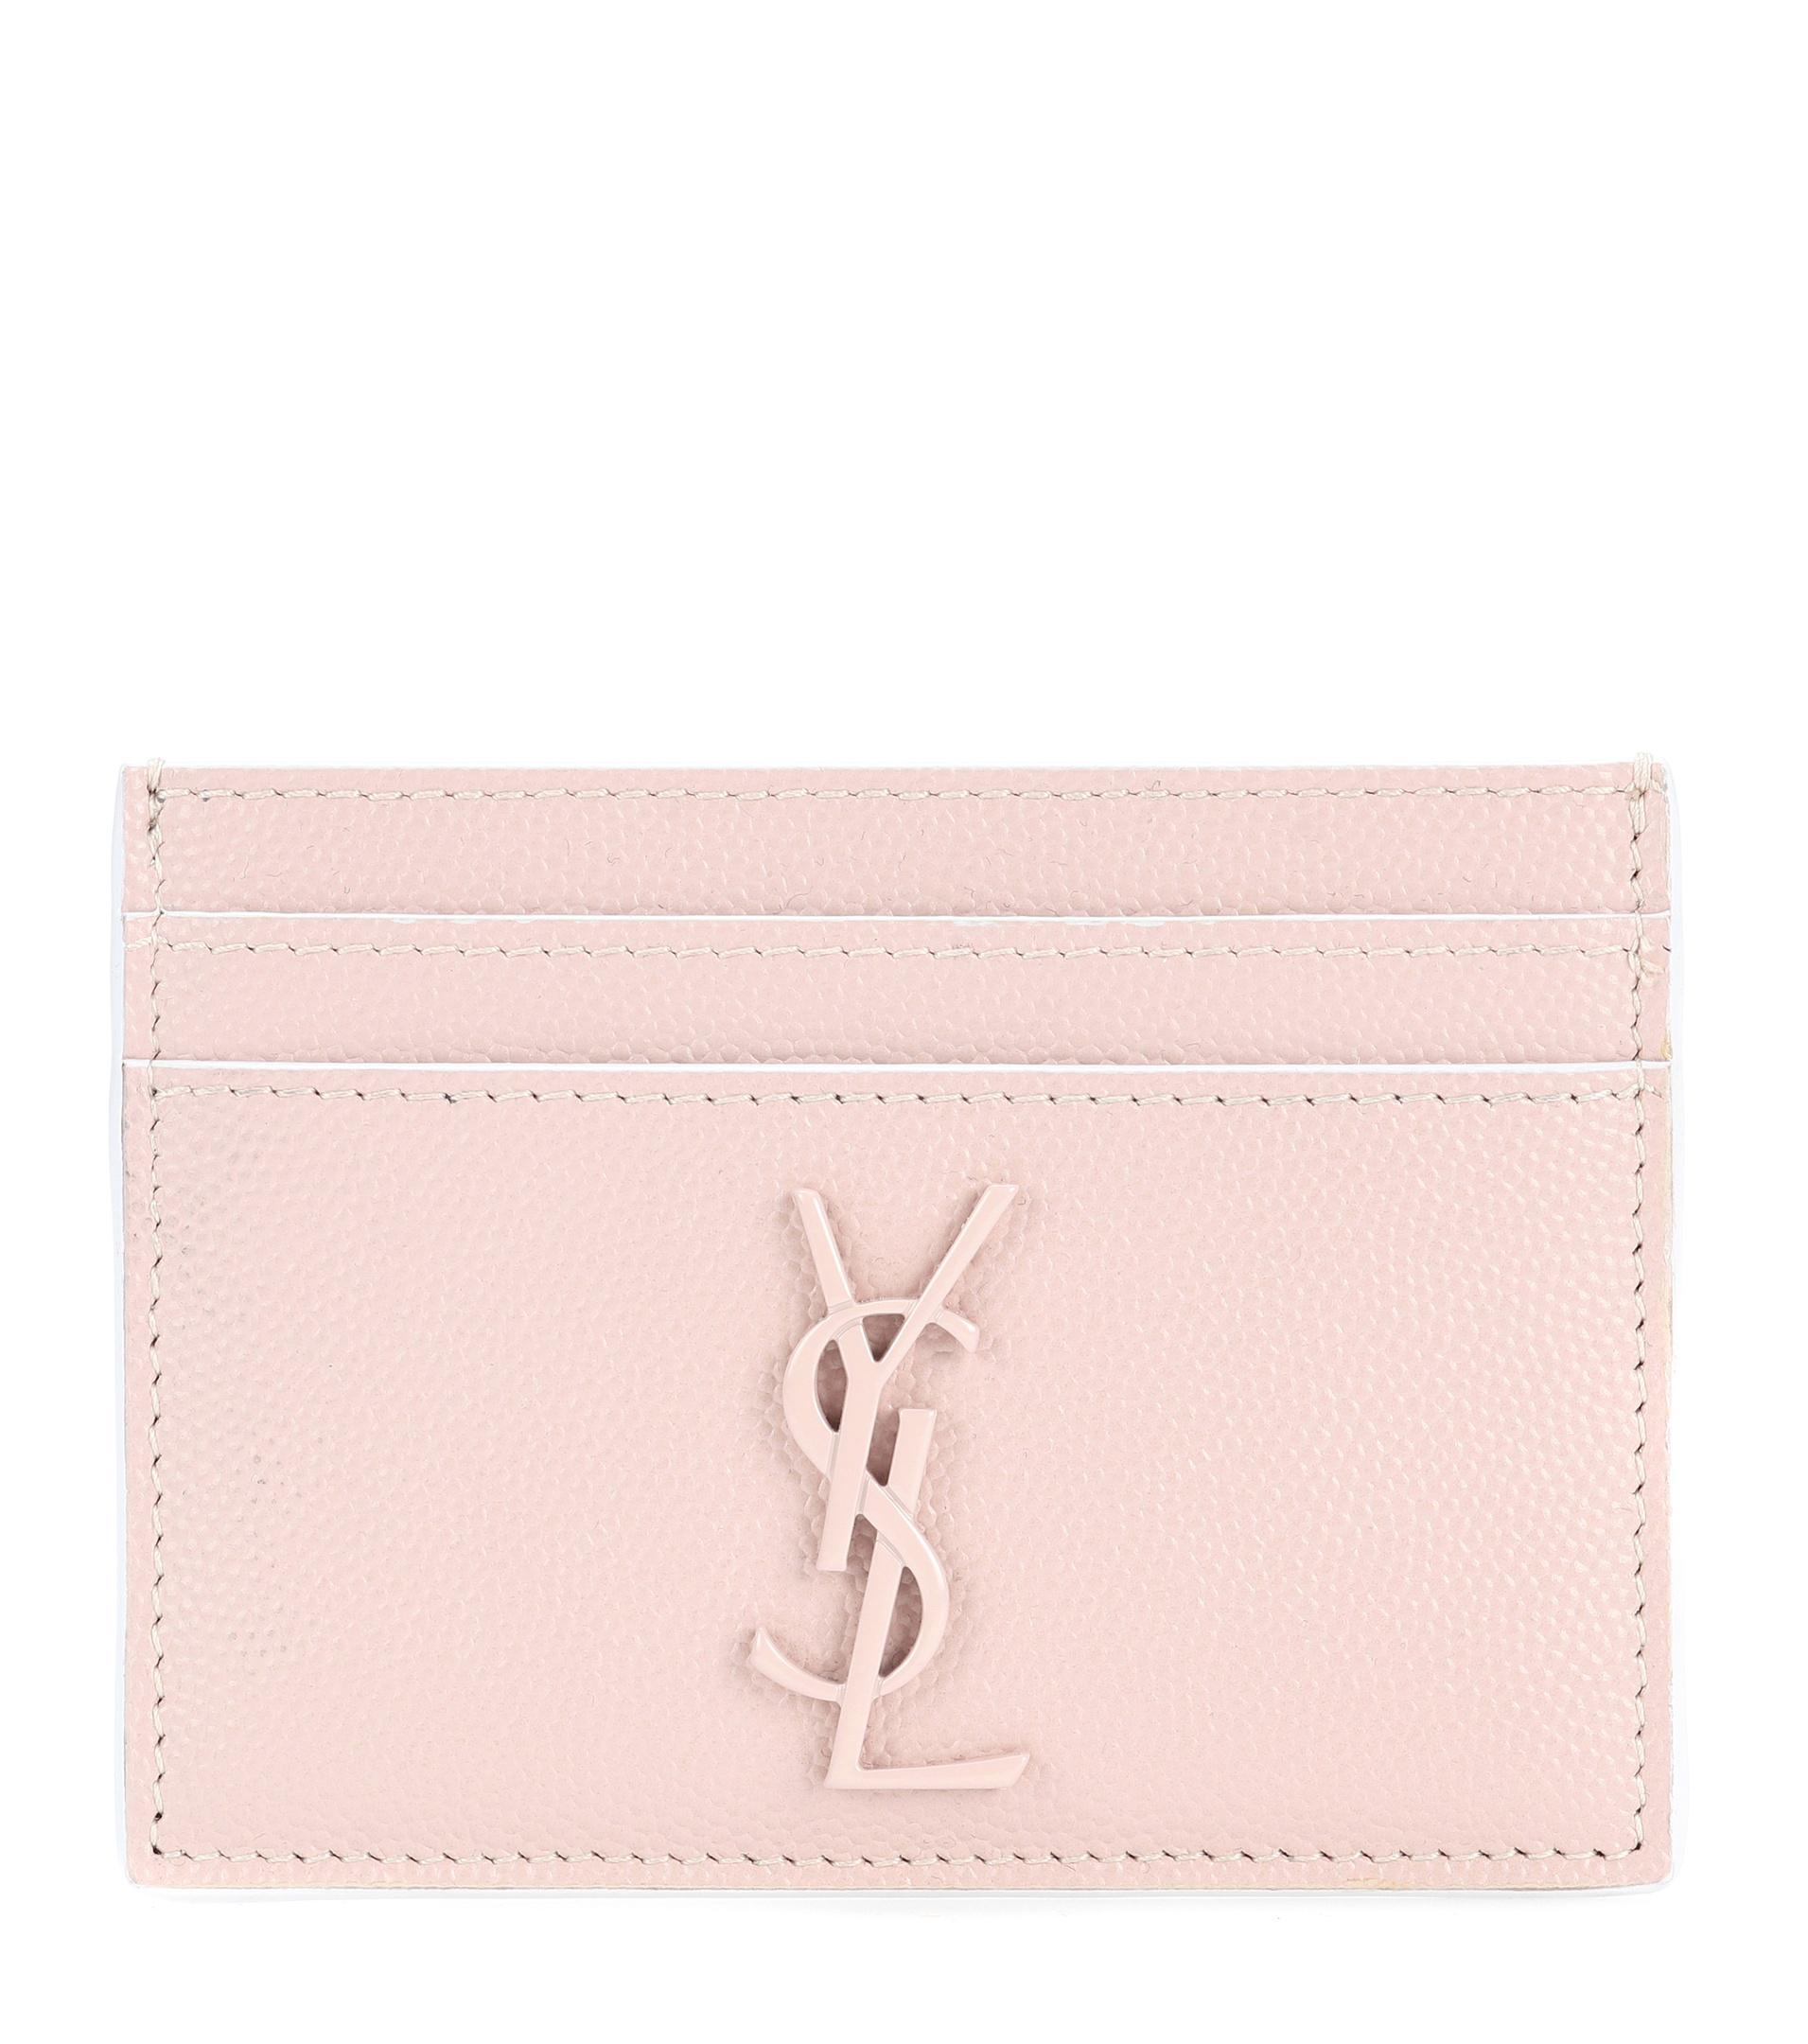 81e149b23b33e Lyst - Saint Laurent Monogram Leather Card Holder in Natural